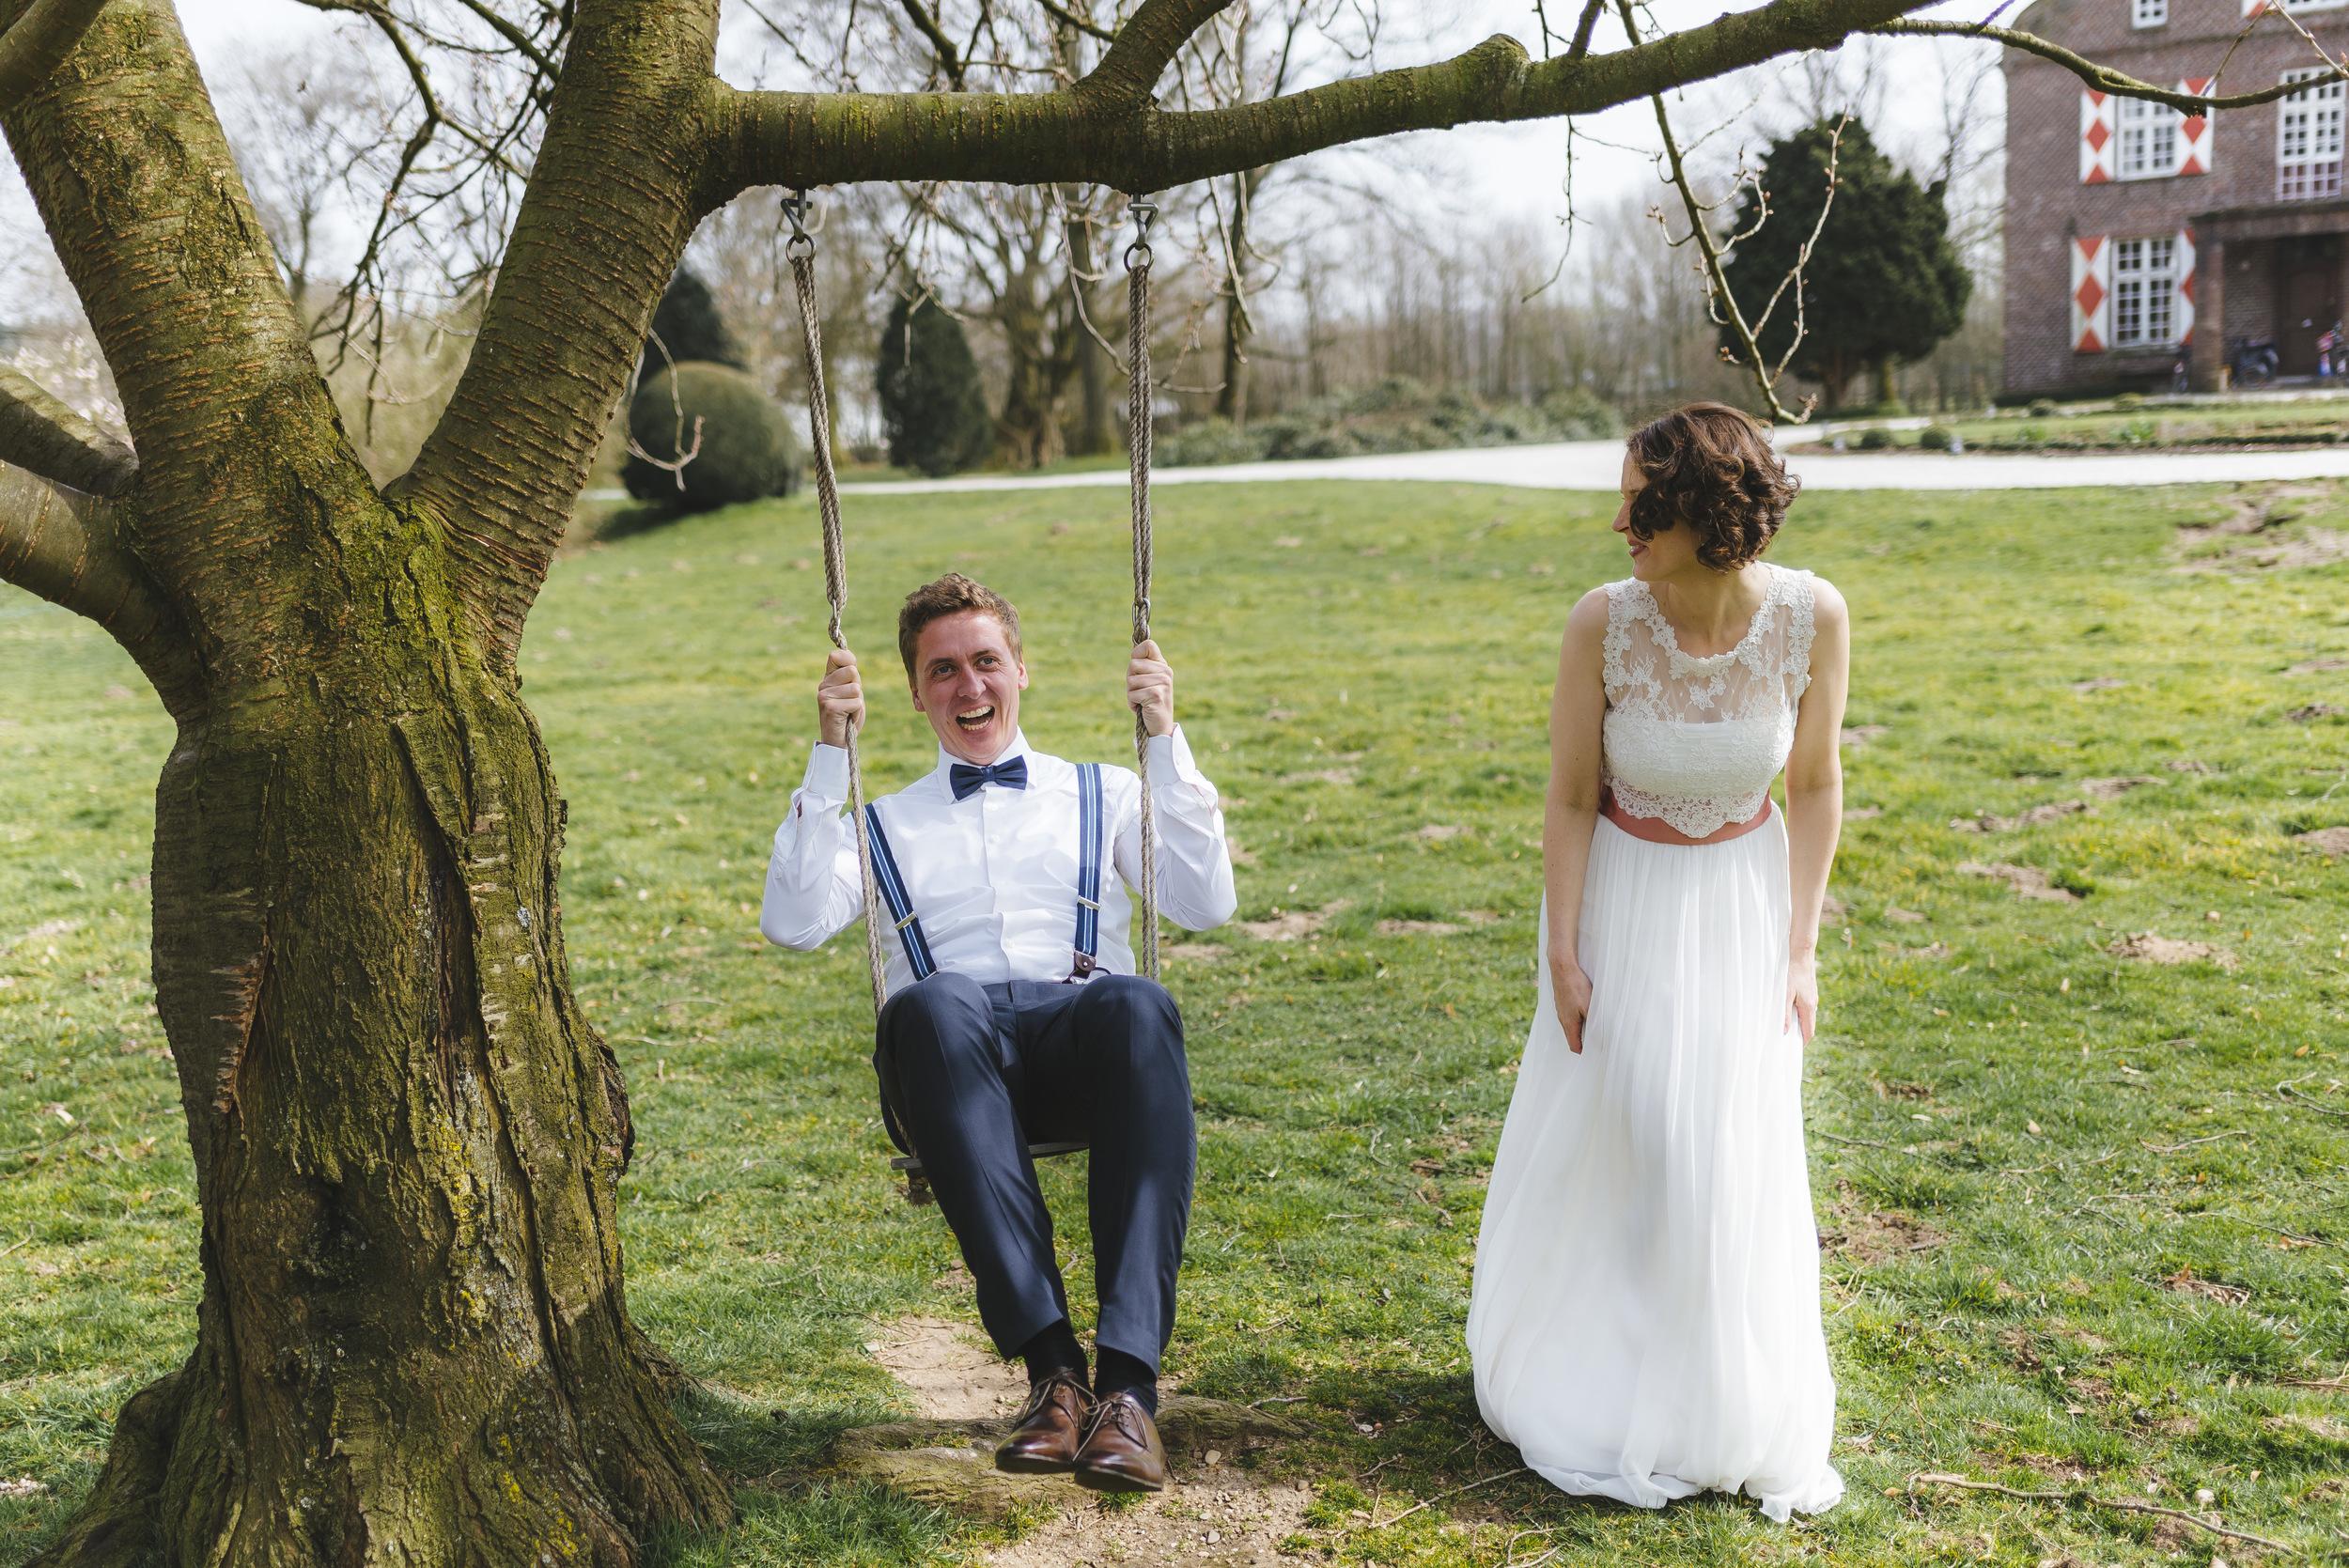 Hochzeitsfotograf-Schlossruine-Hertefeld-Weeze-039.jpg